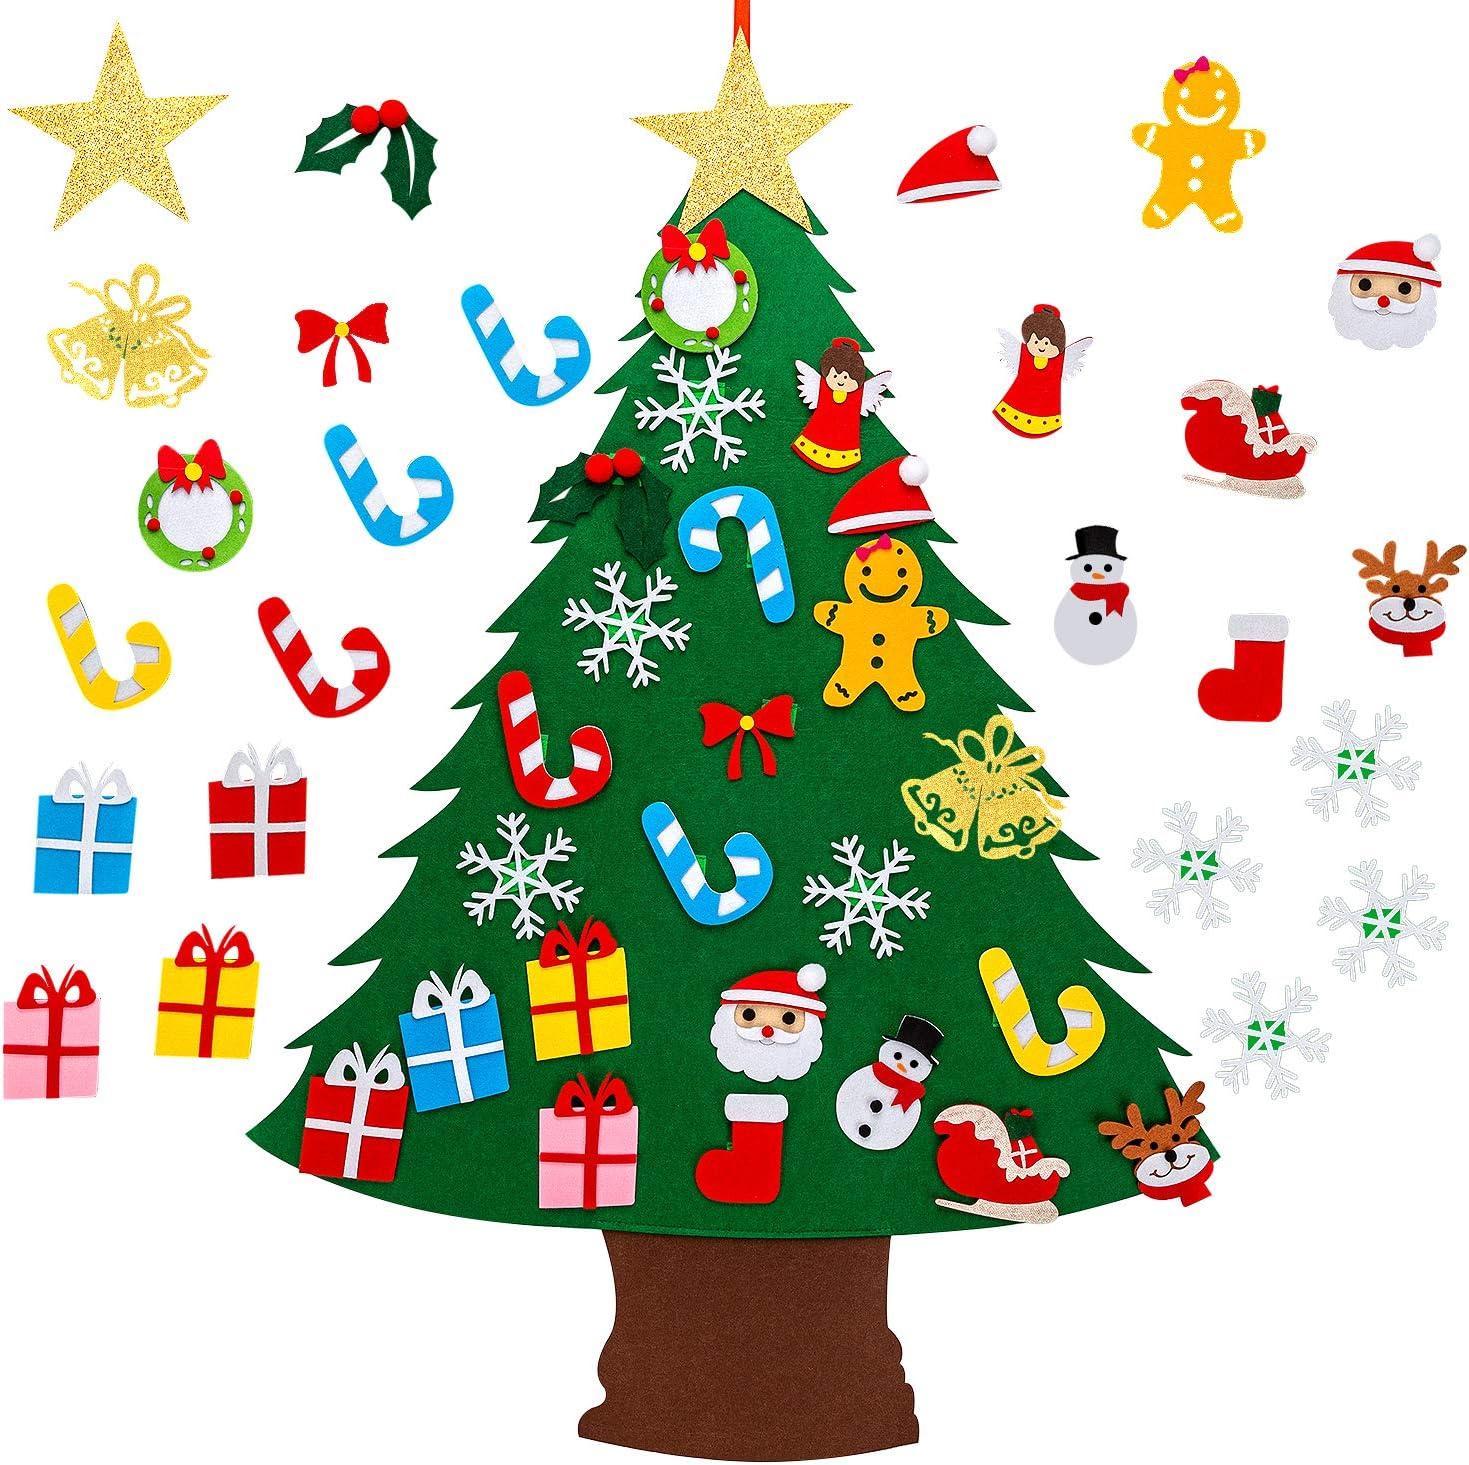 Amazon Com Savita 3 1ft Felt Christmas Tree Diy Christmas Tree With 25pcs Ornaments Christmas Decorations Door Wall Hanging Ornaments For Kids Xmas Gifts Party Supplies Home Kitchen